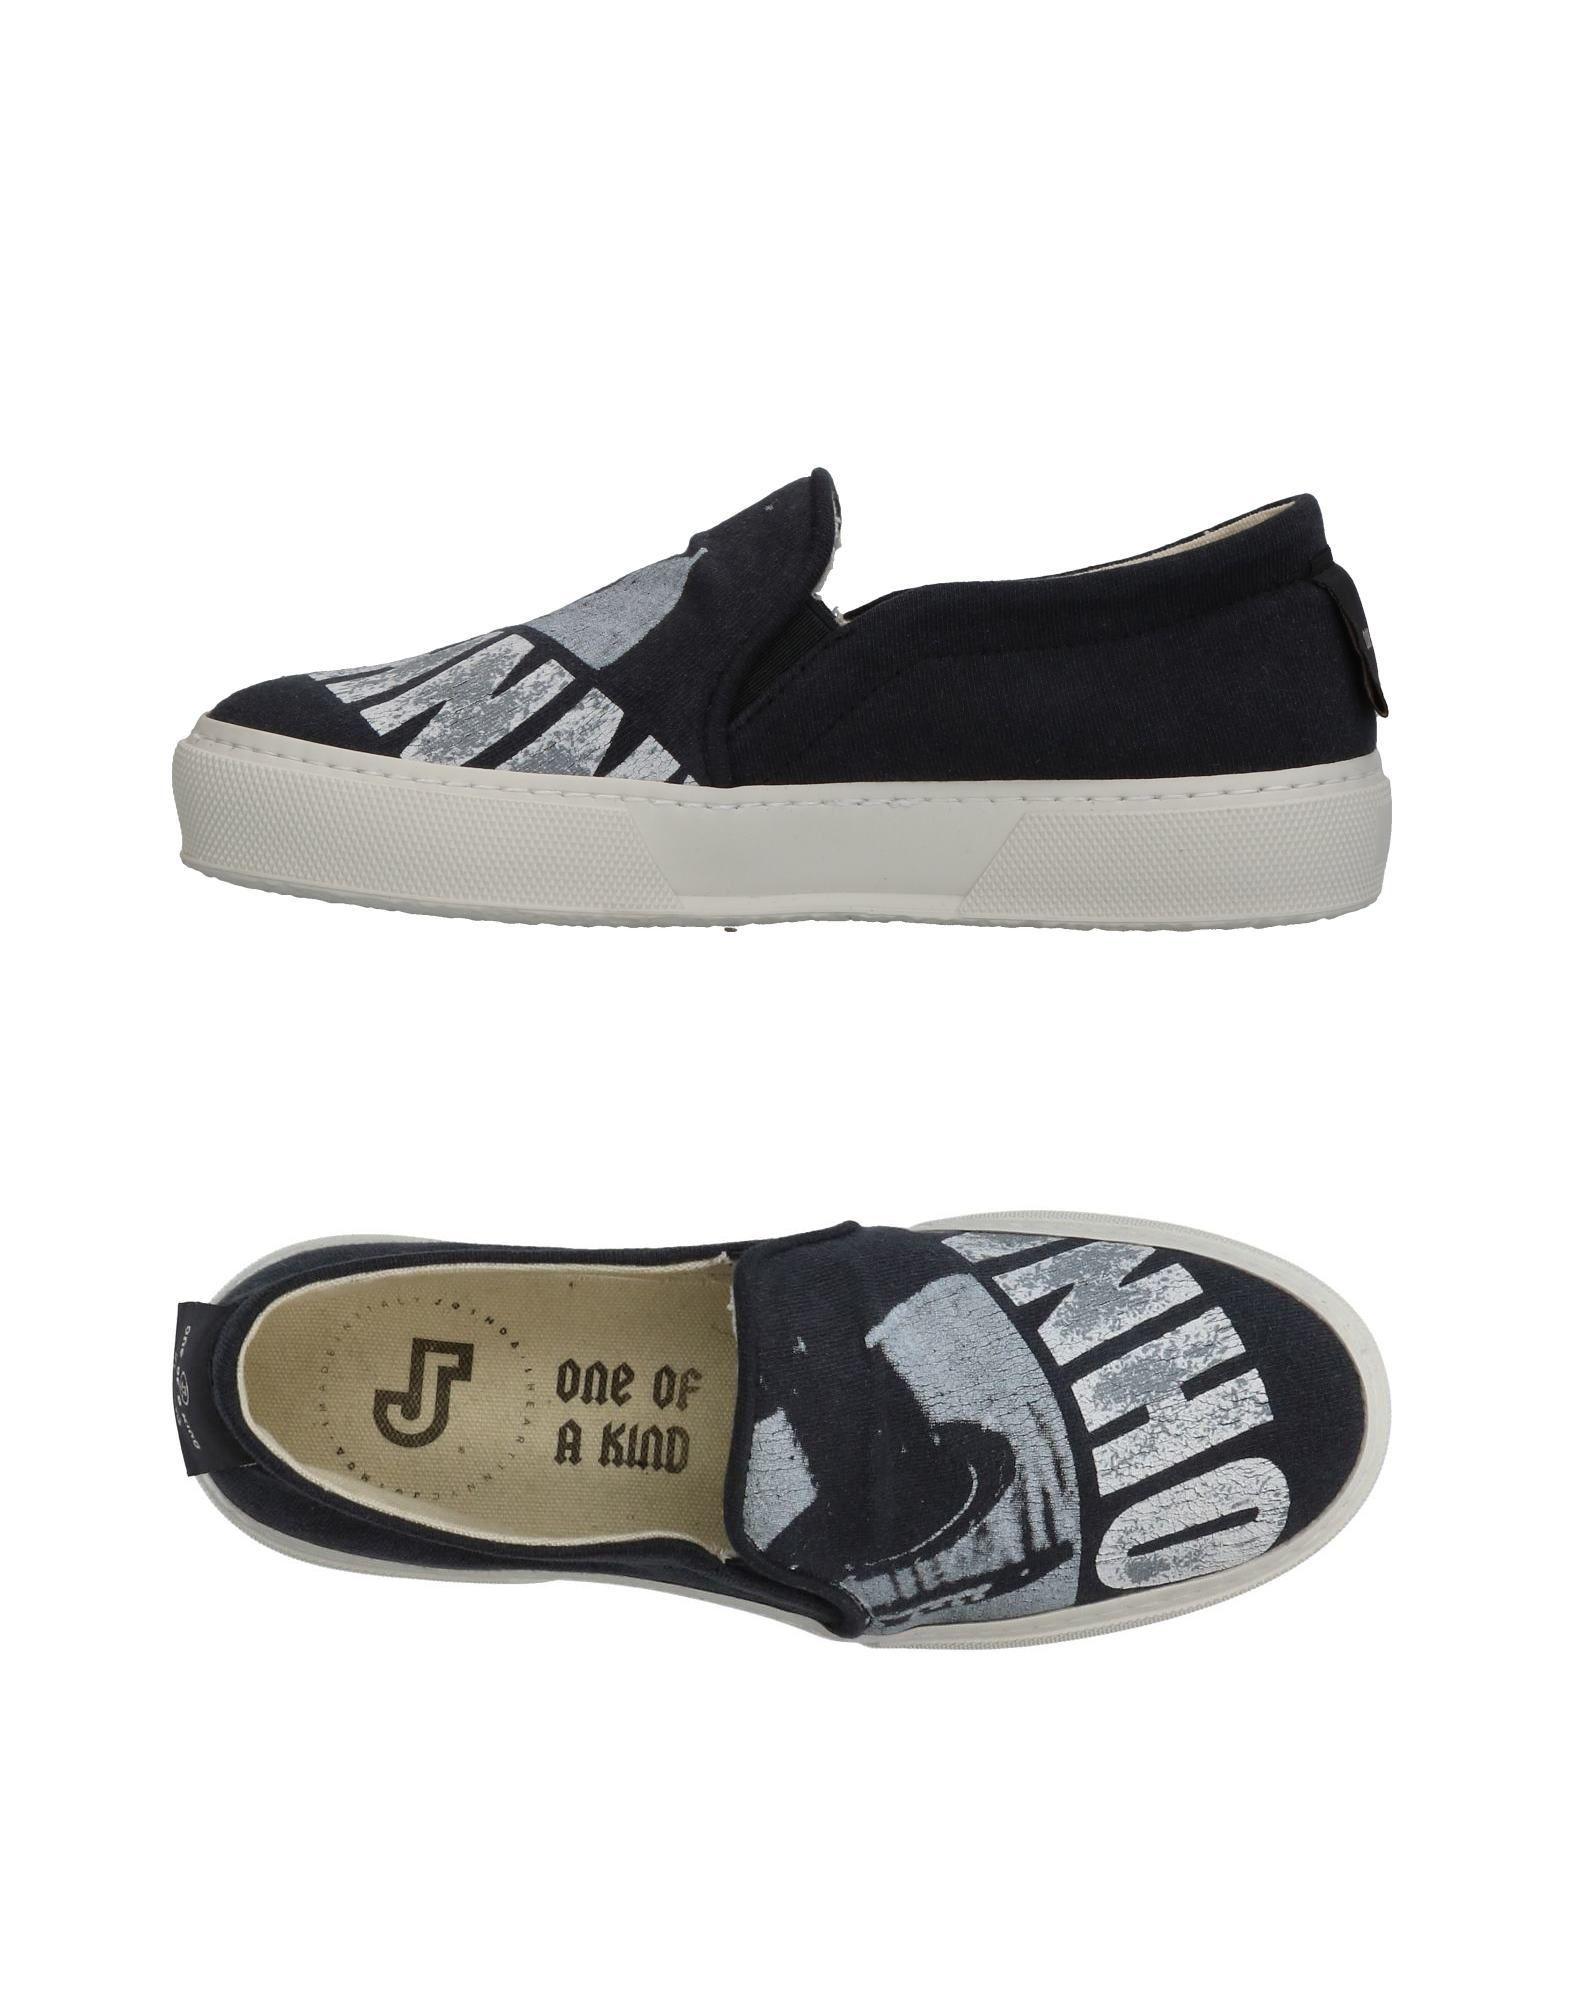 Joshua*S Sneakers Damen  11343151KBGut aussehende strapazierfähige Schuhe